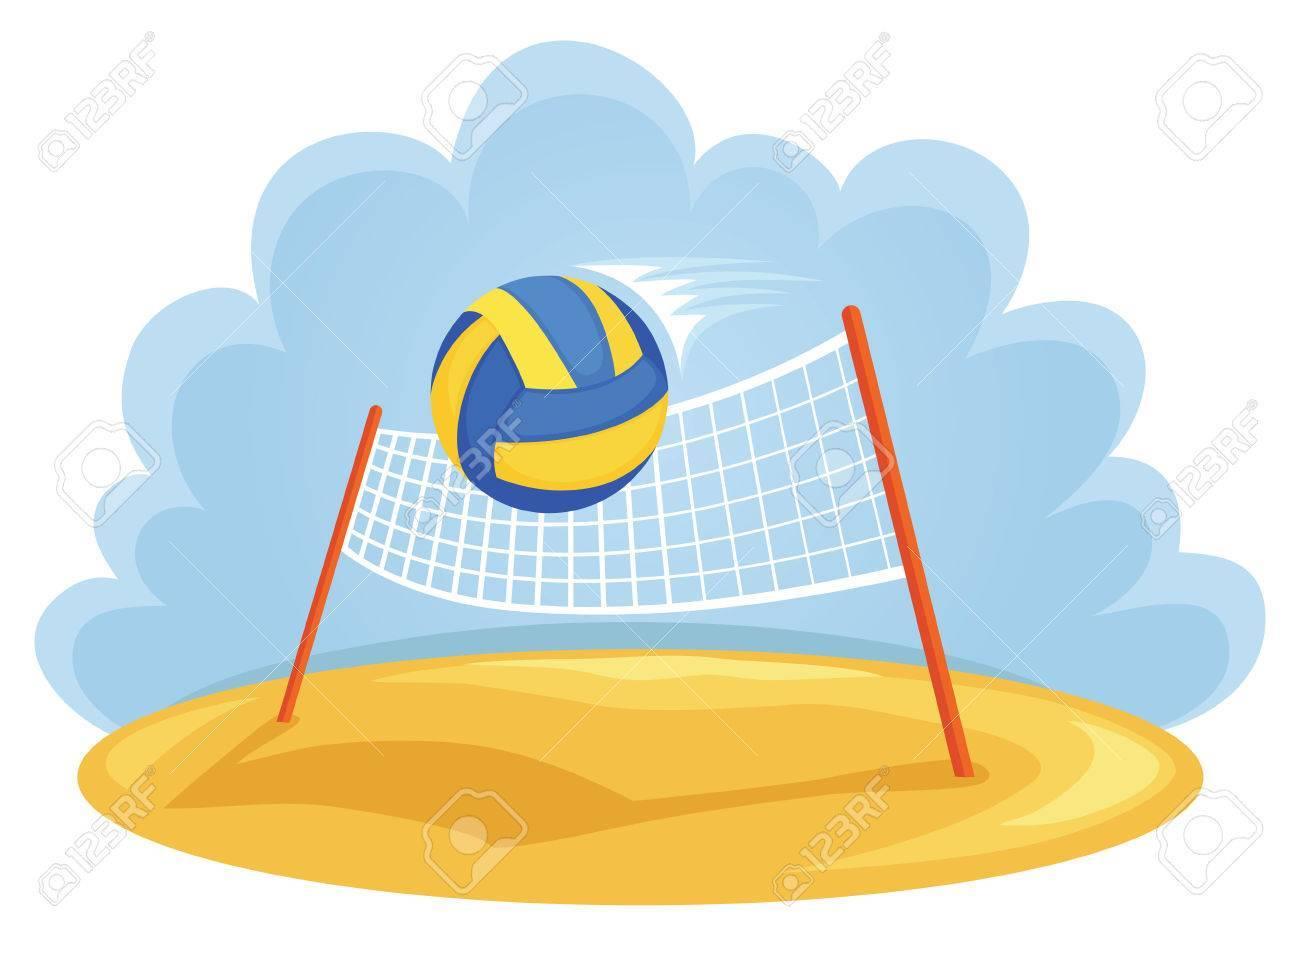 Summer sports clipart clipart free Summer sports » Clipart Portal clipart free